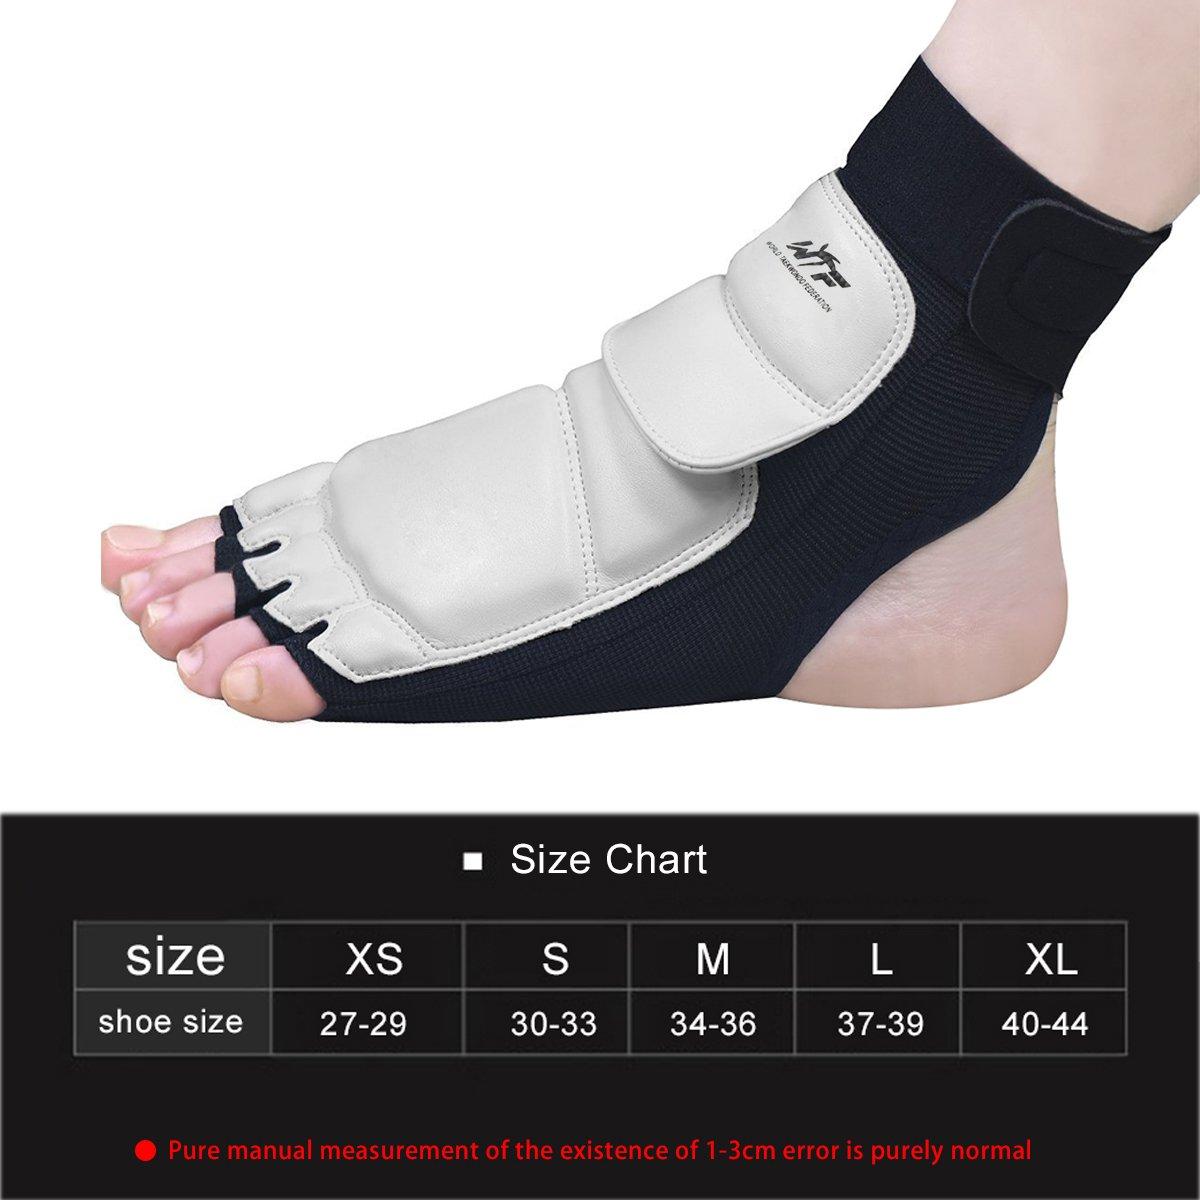 Drako TKD Foot Protector